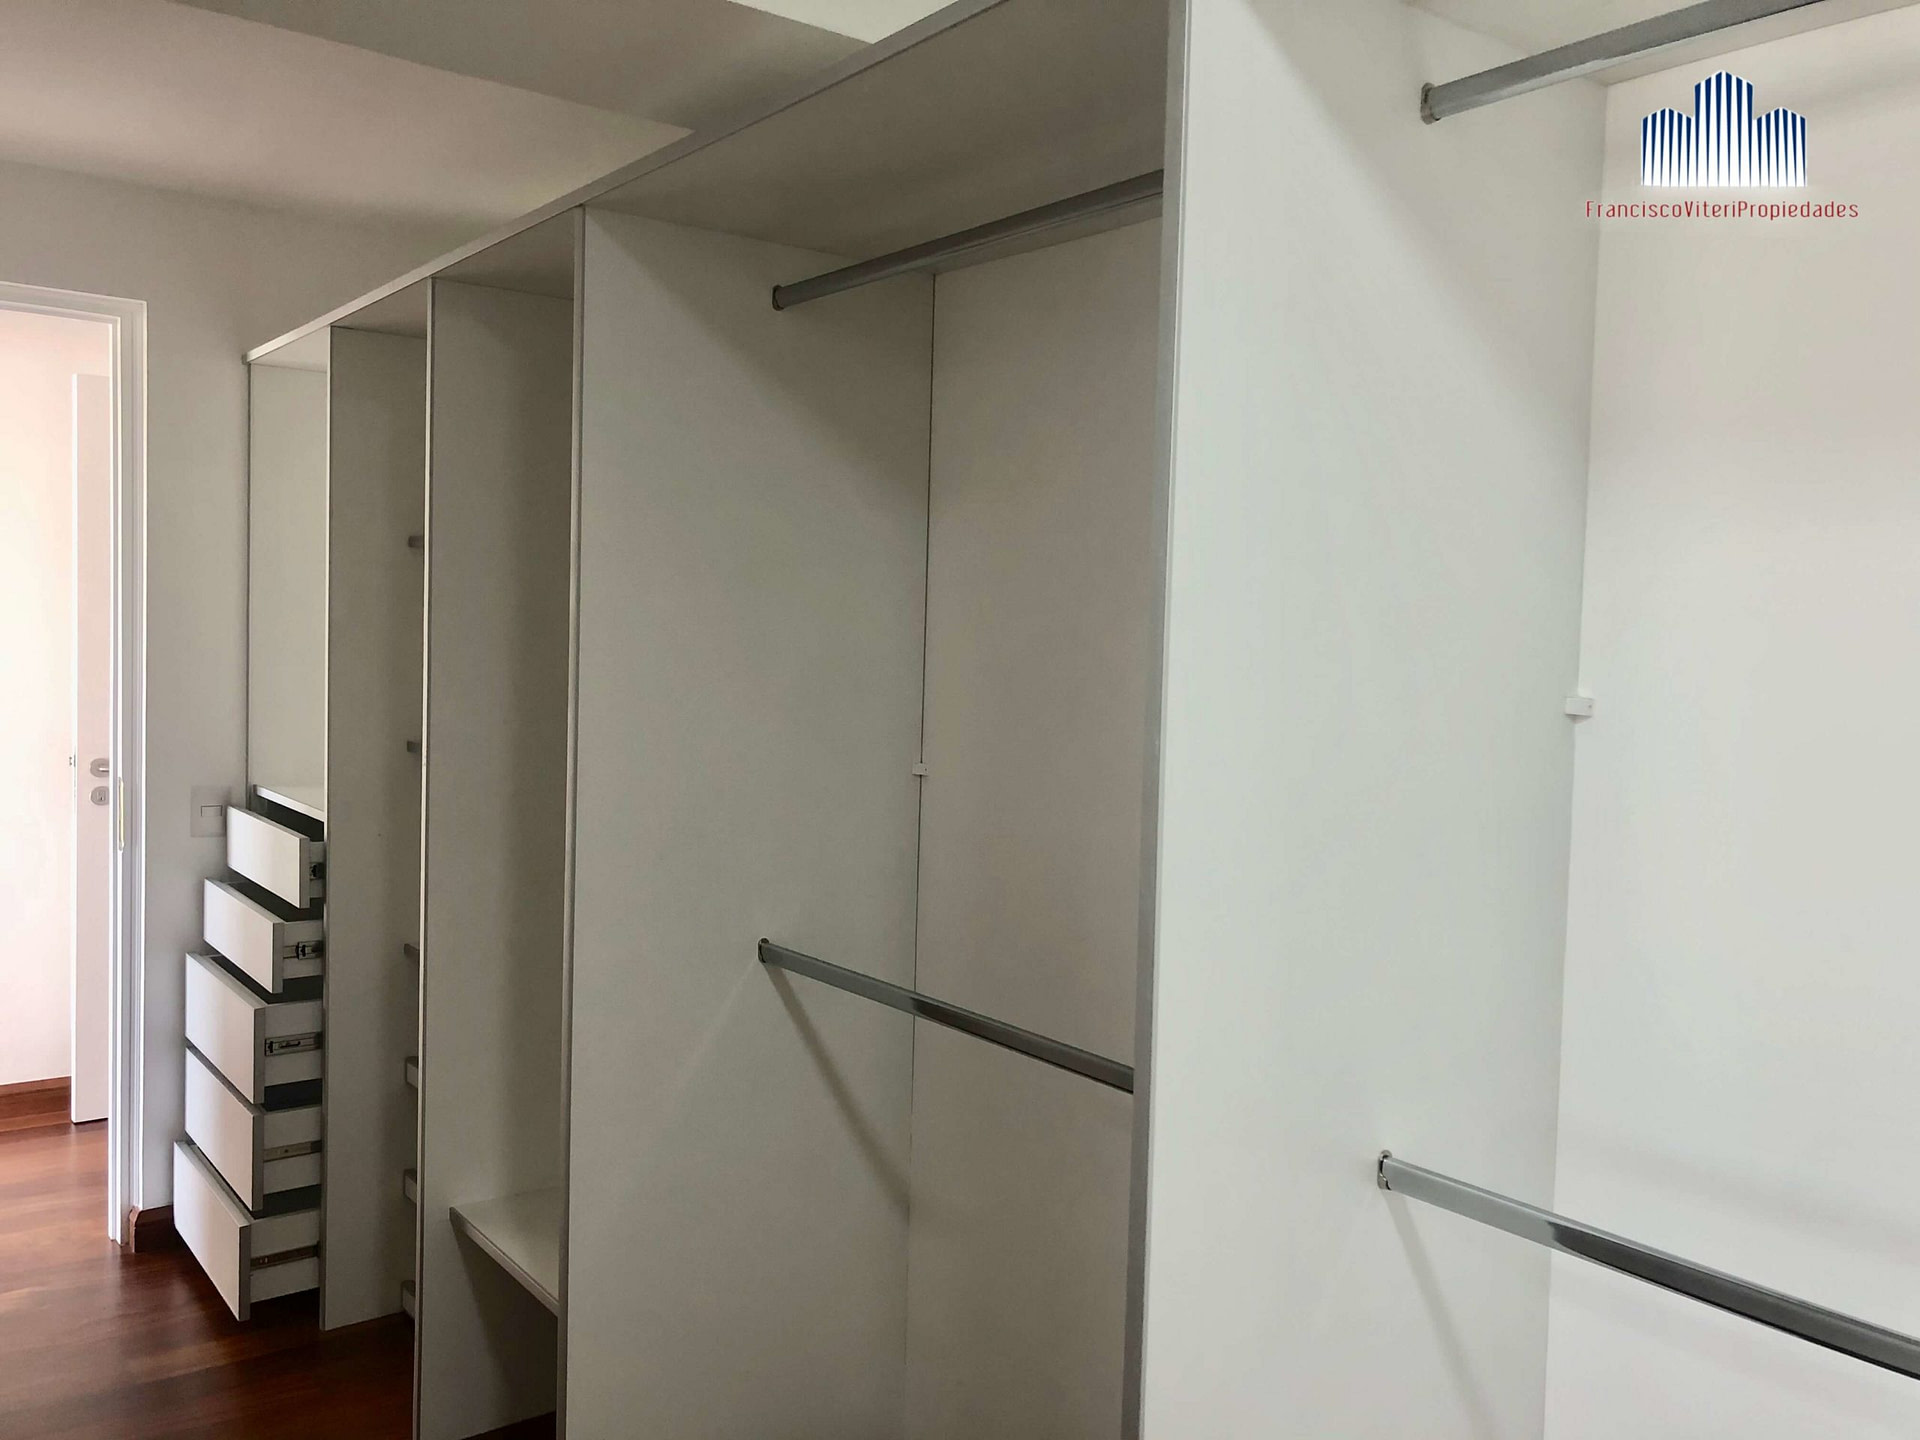 ARQUITECTO MARIO LARA- ESPECTACULAR PENTHOUSE DE ESTRENO CON TERRAZA PISCINA Y JARDIN